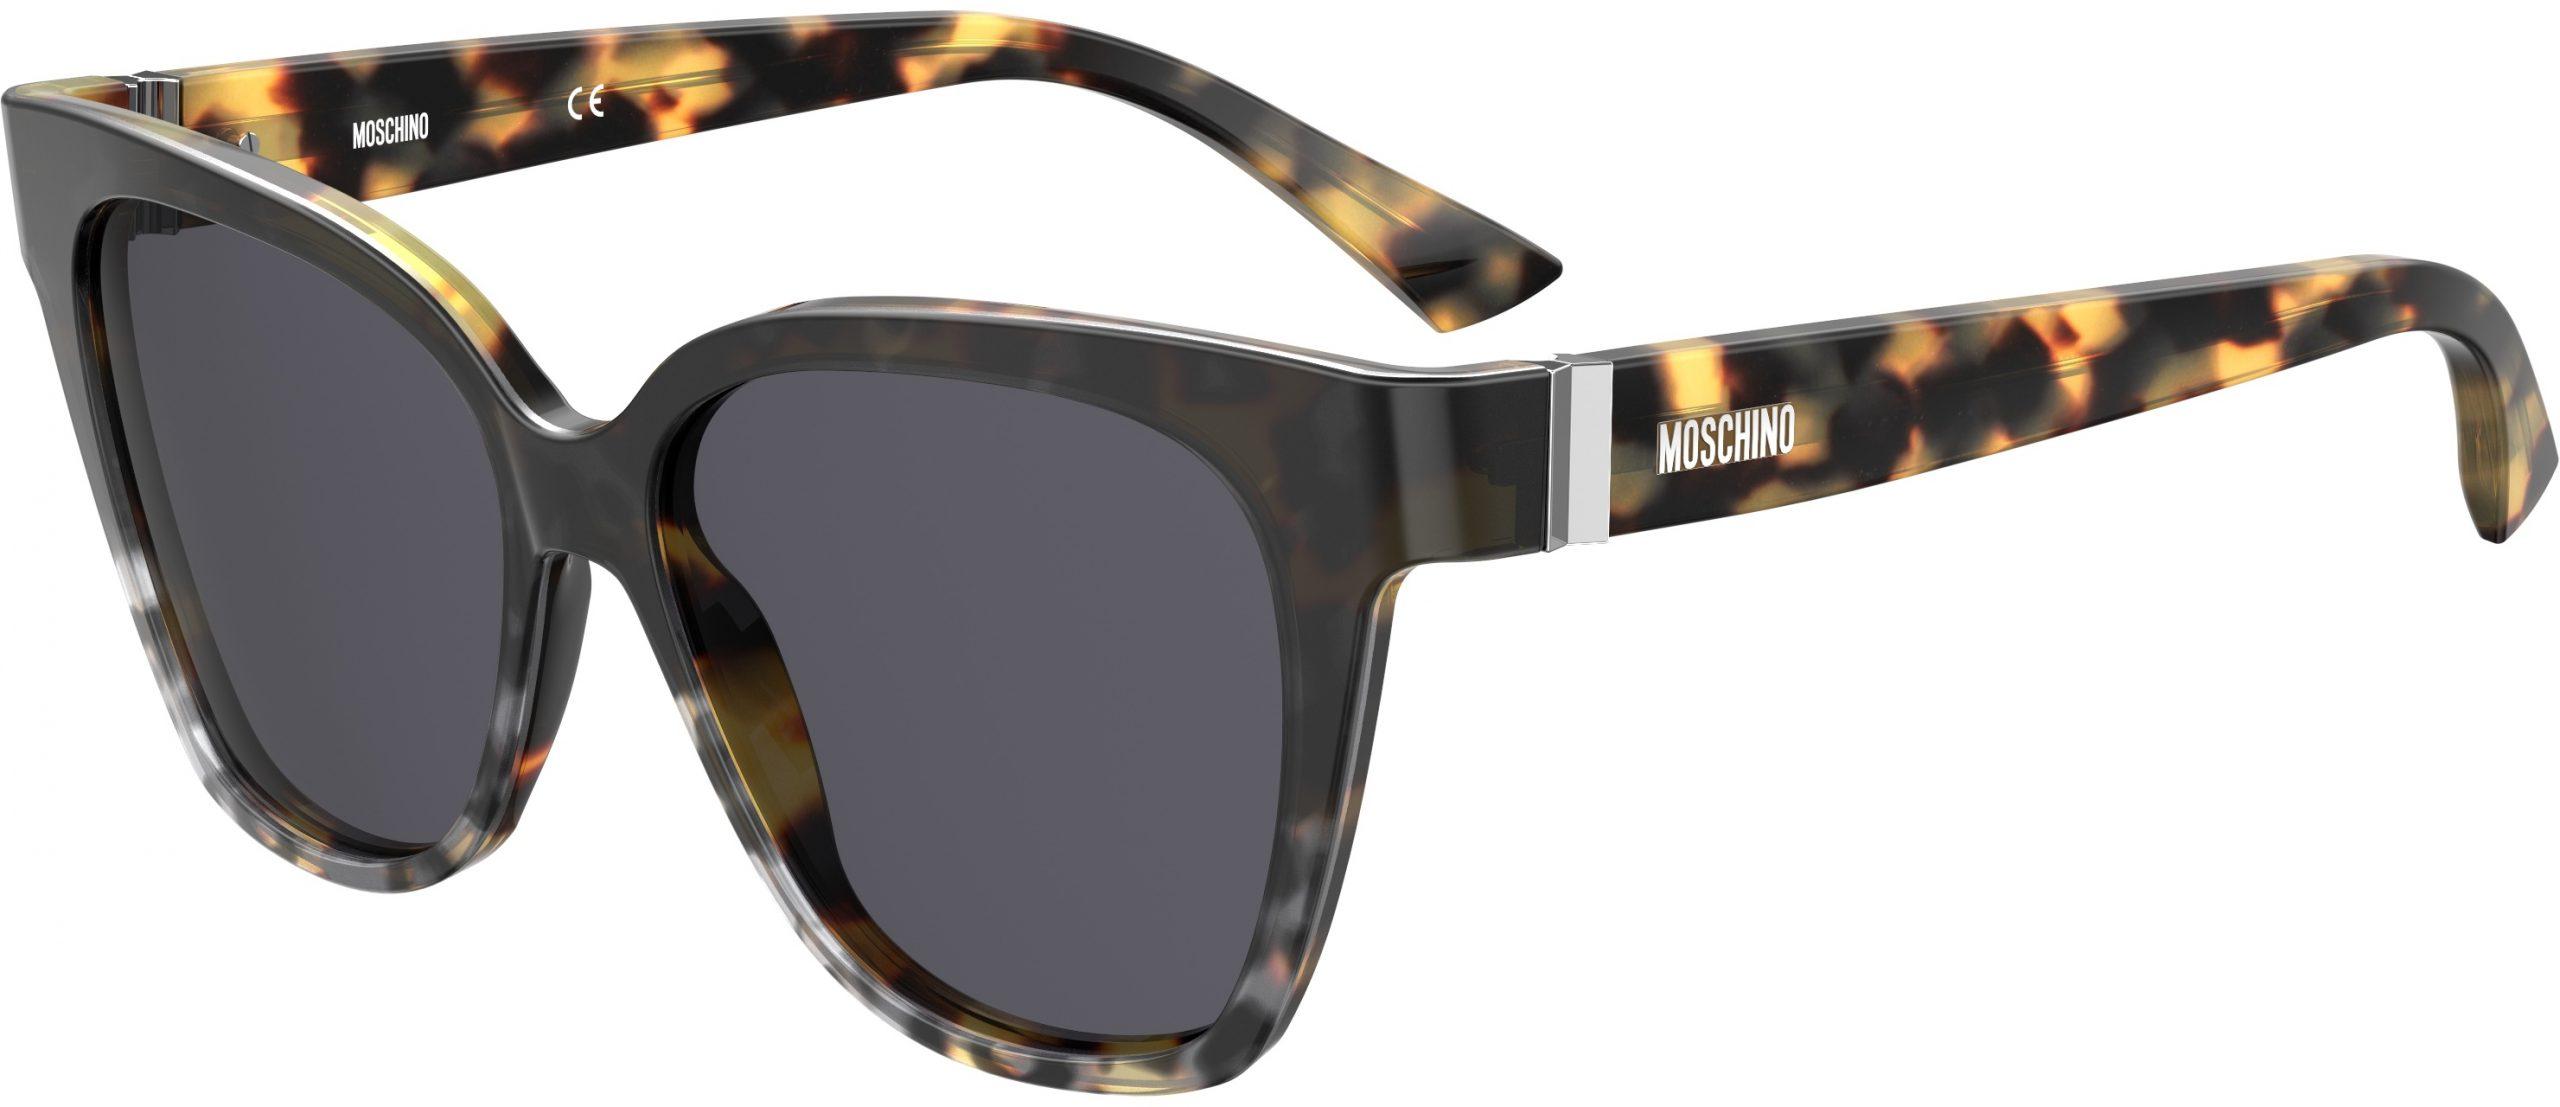 Moschino MOS066/S 202730-PUU/IR-55 | 716736220345